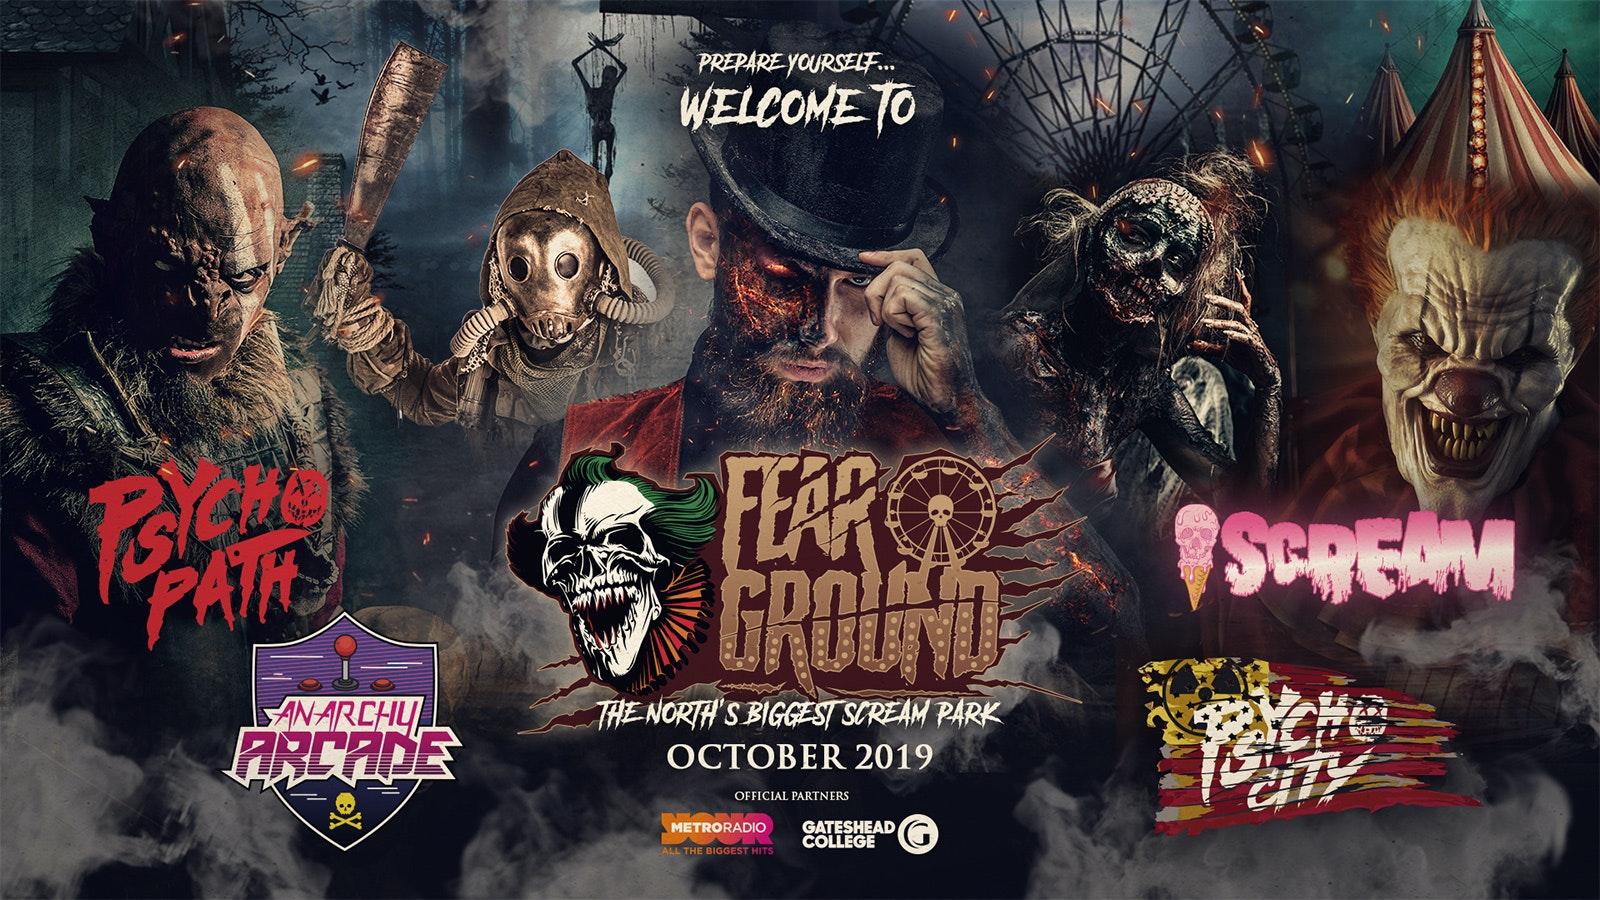 Psycho Path – Sunday 27th October 2019